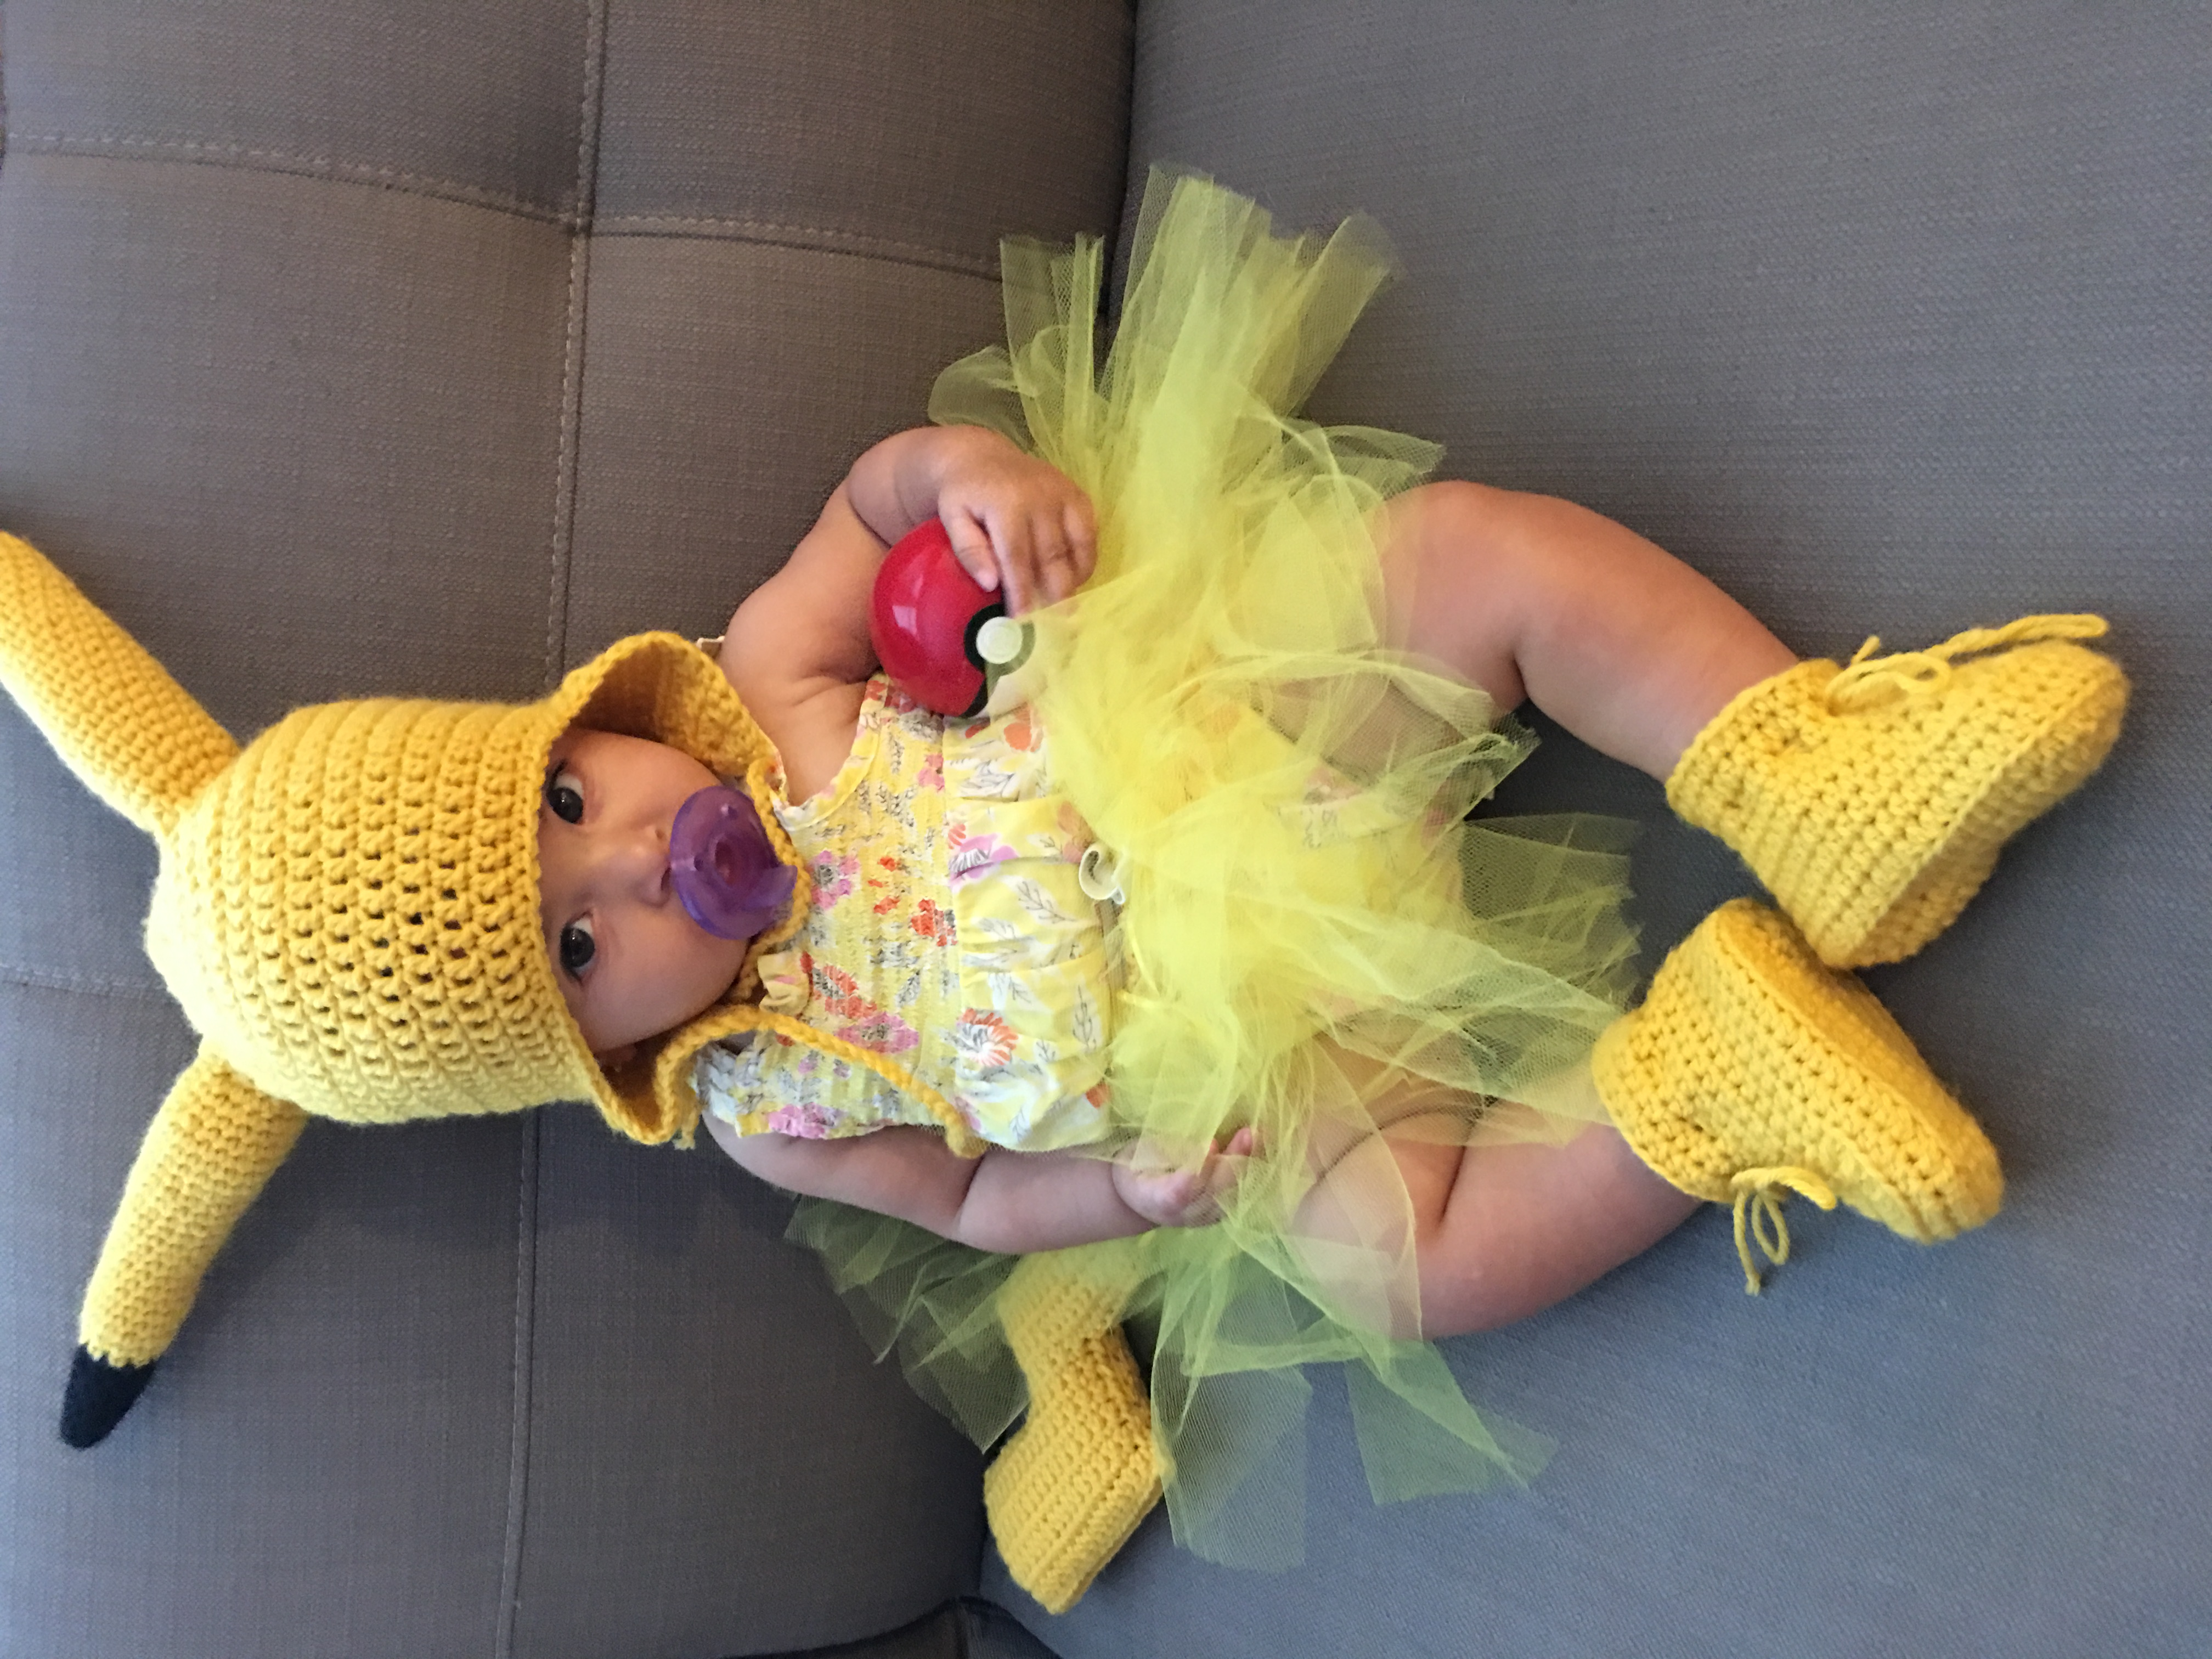 Bay Pikachu Costume